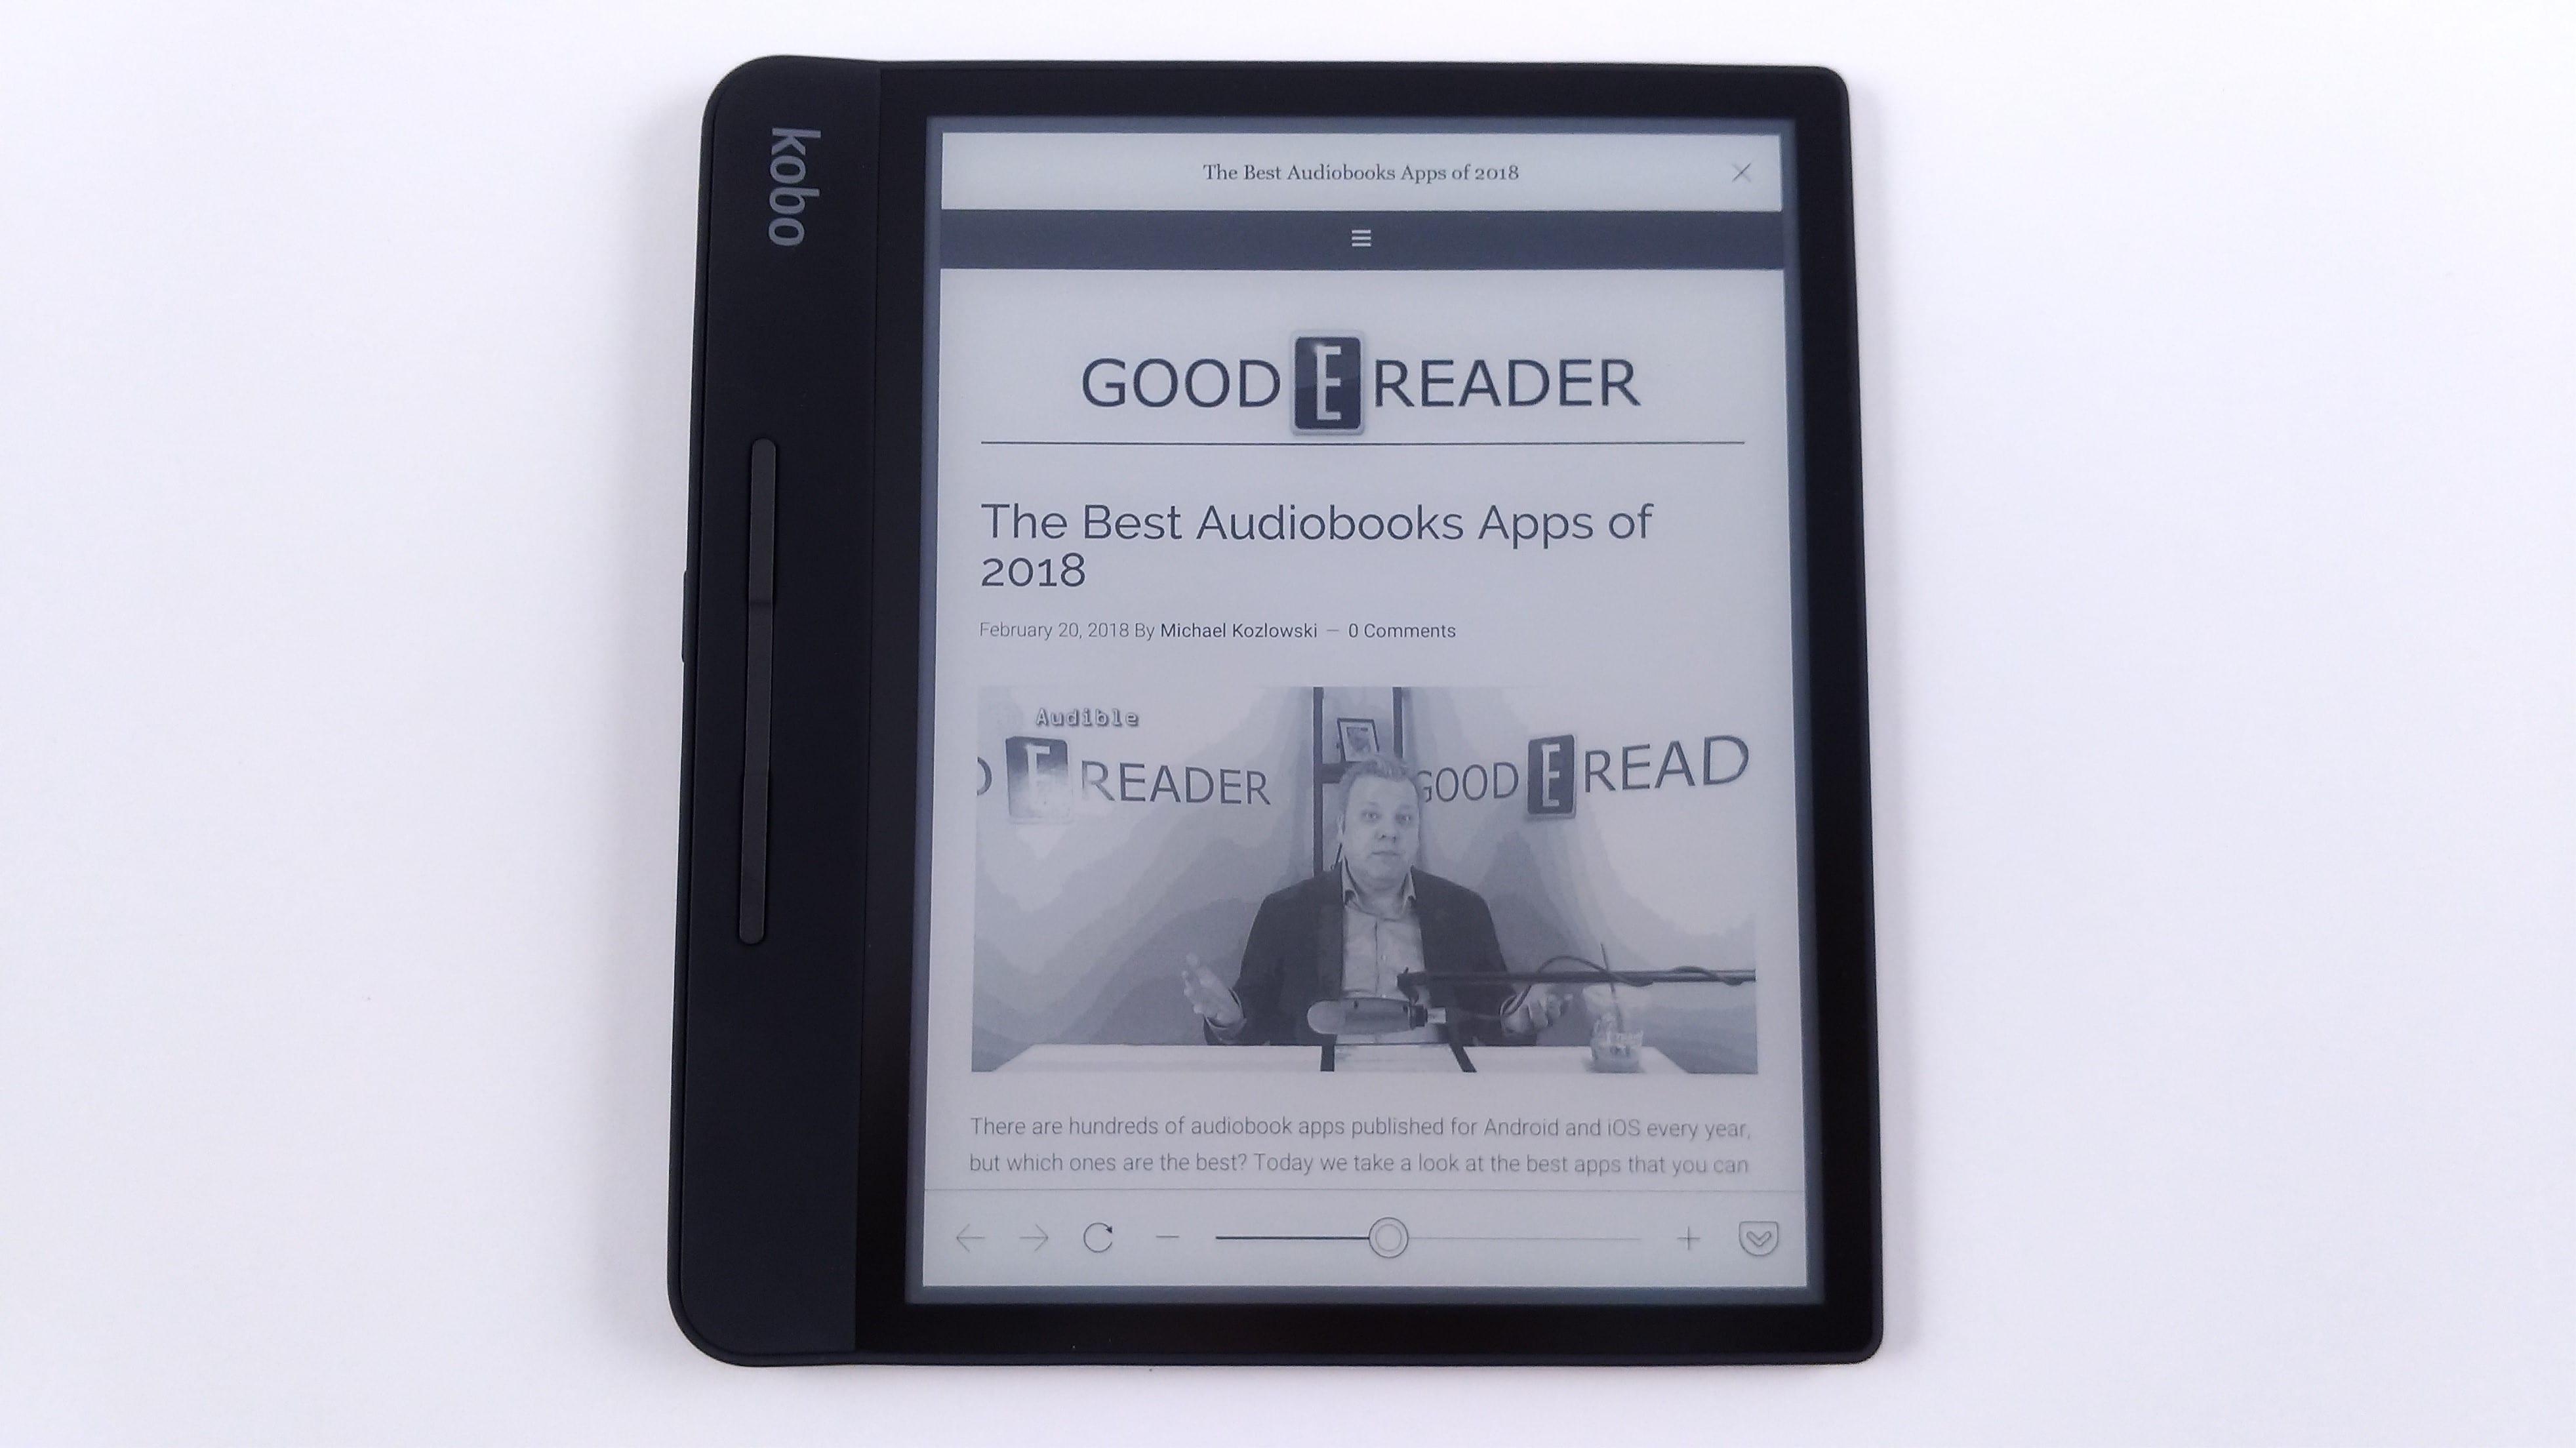 ebook reader price